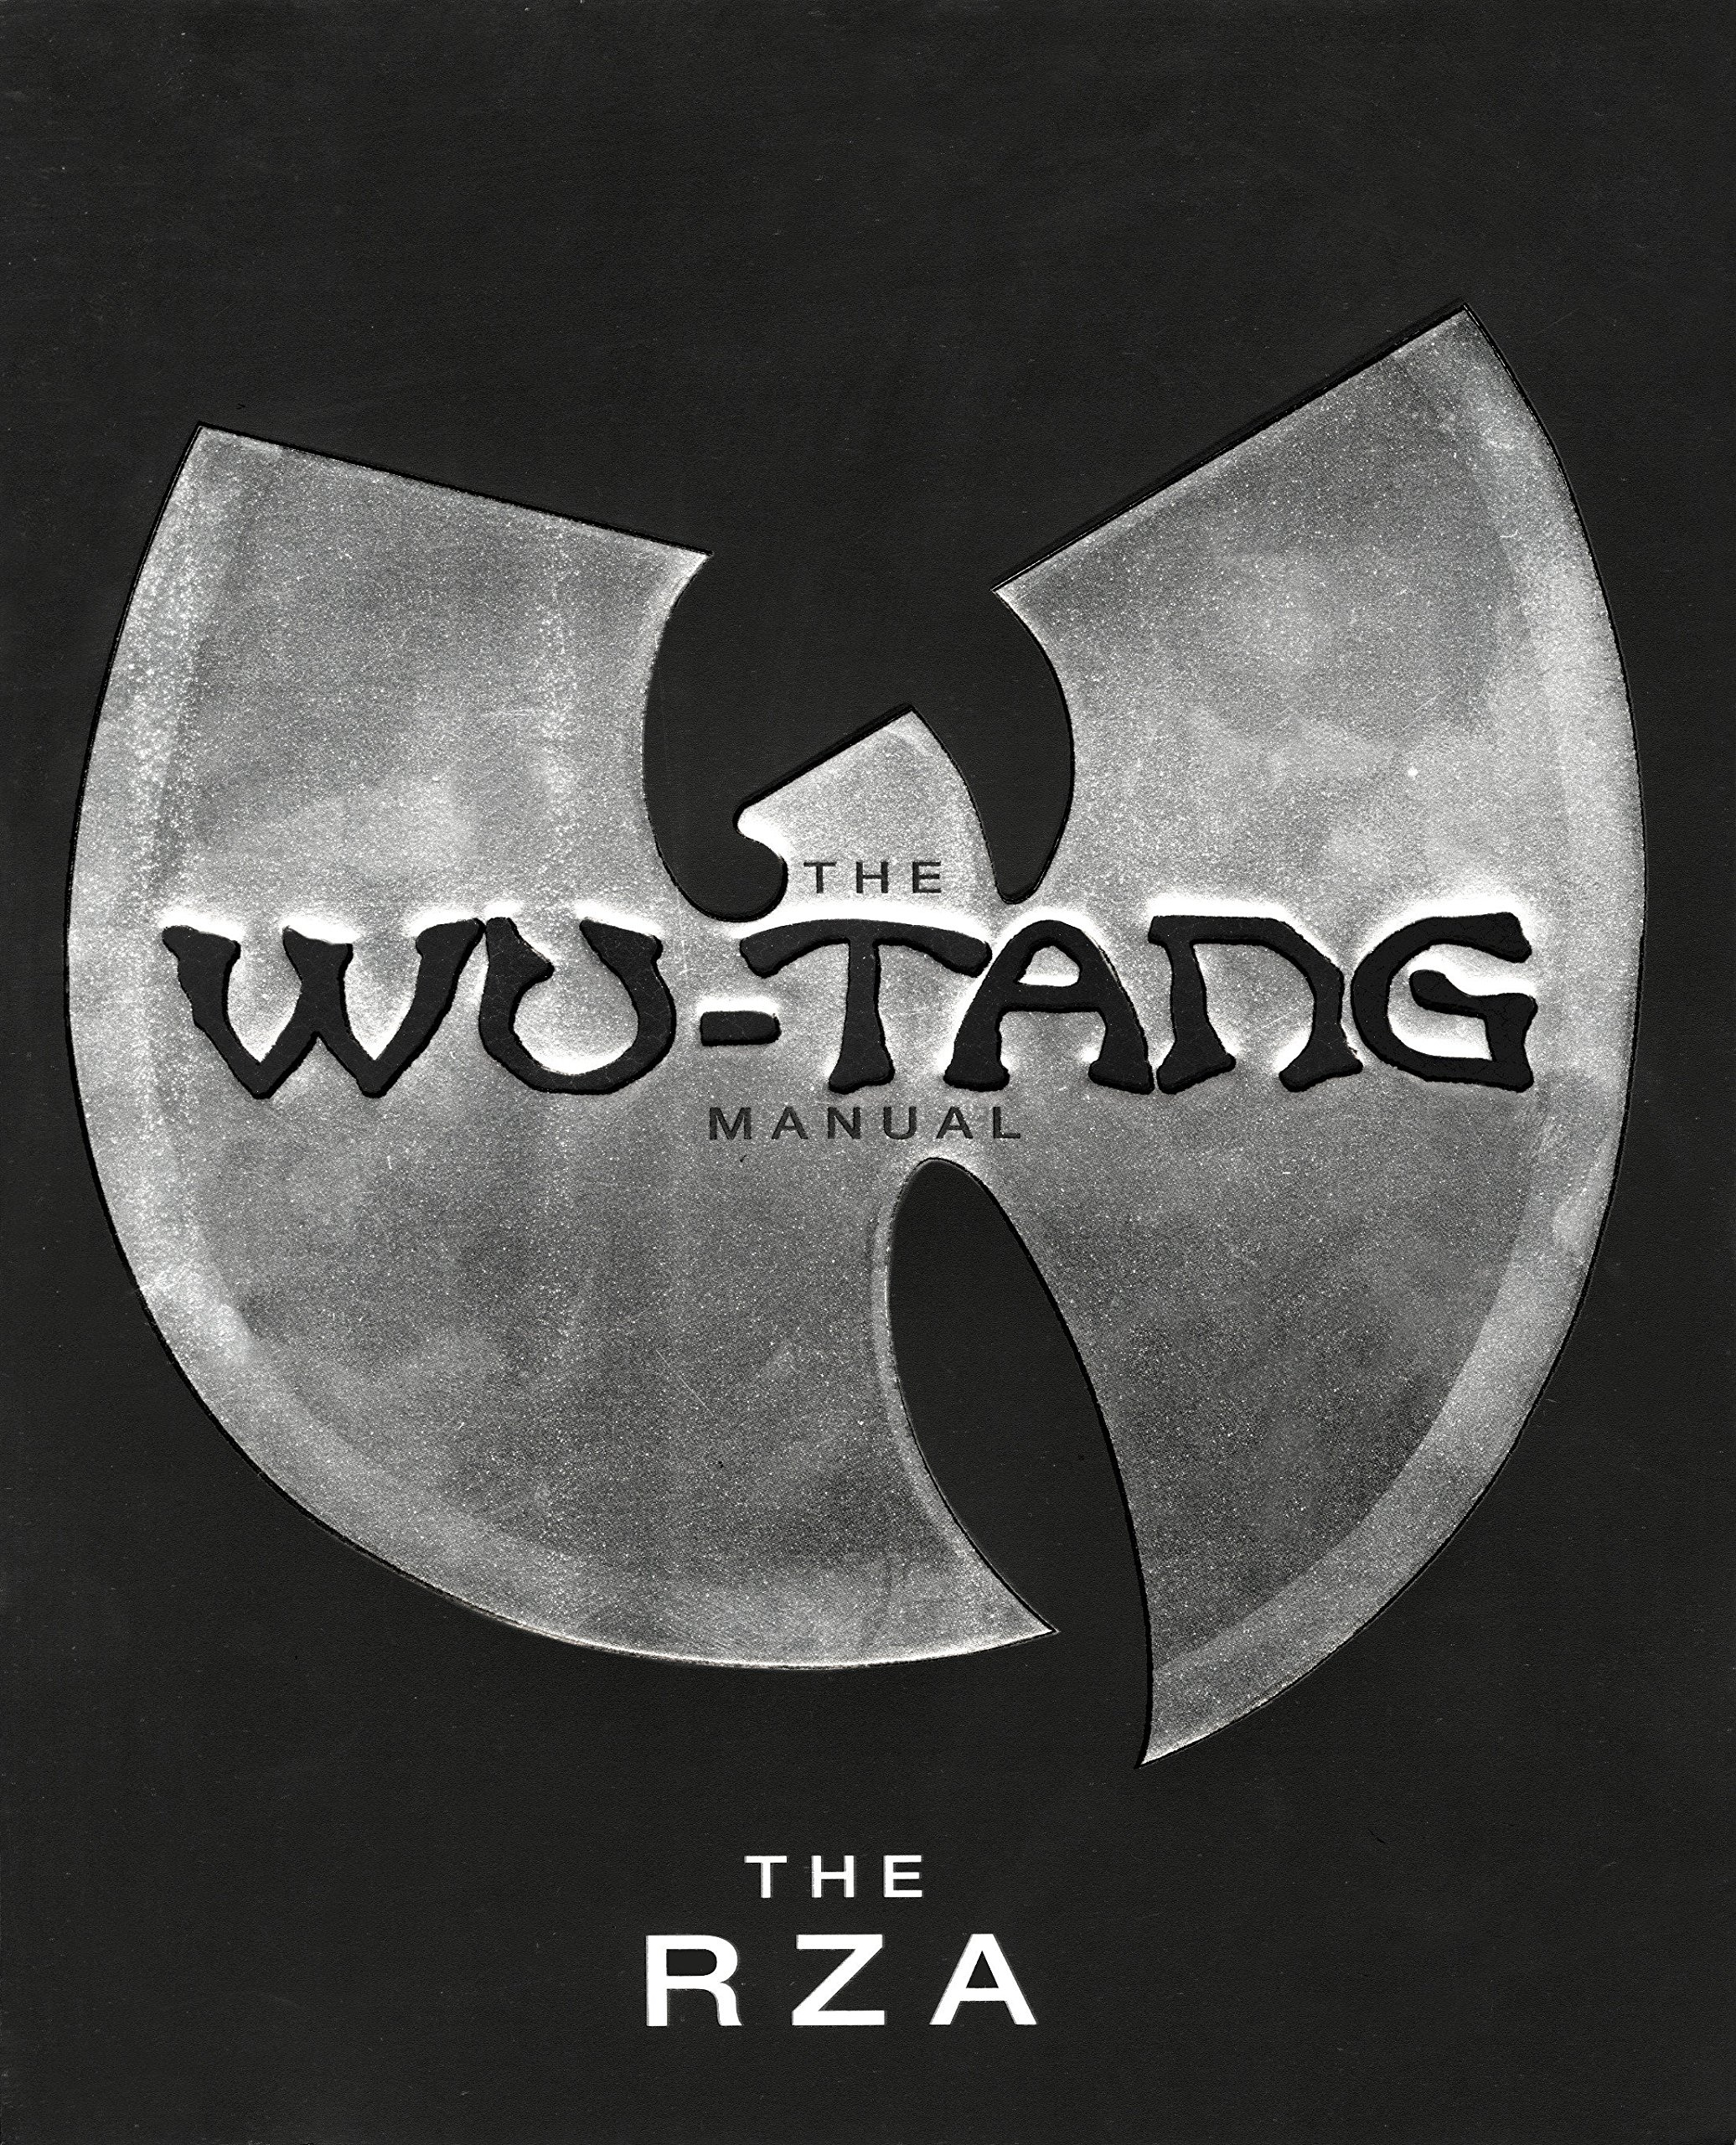 Amazon.com: The Wu-Tang Manual (0710261022009): The RZA, Chris Norris: Books